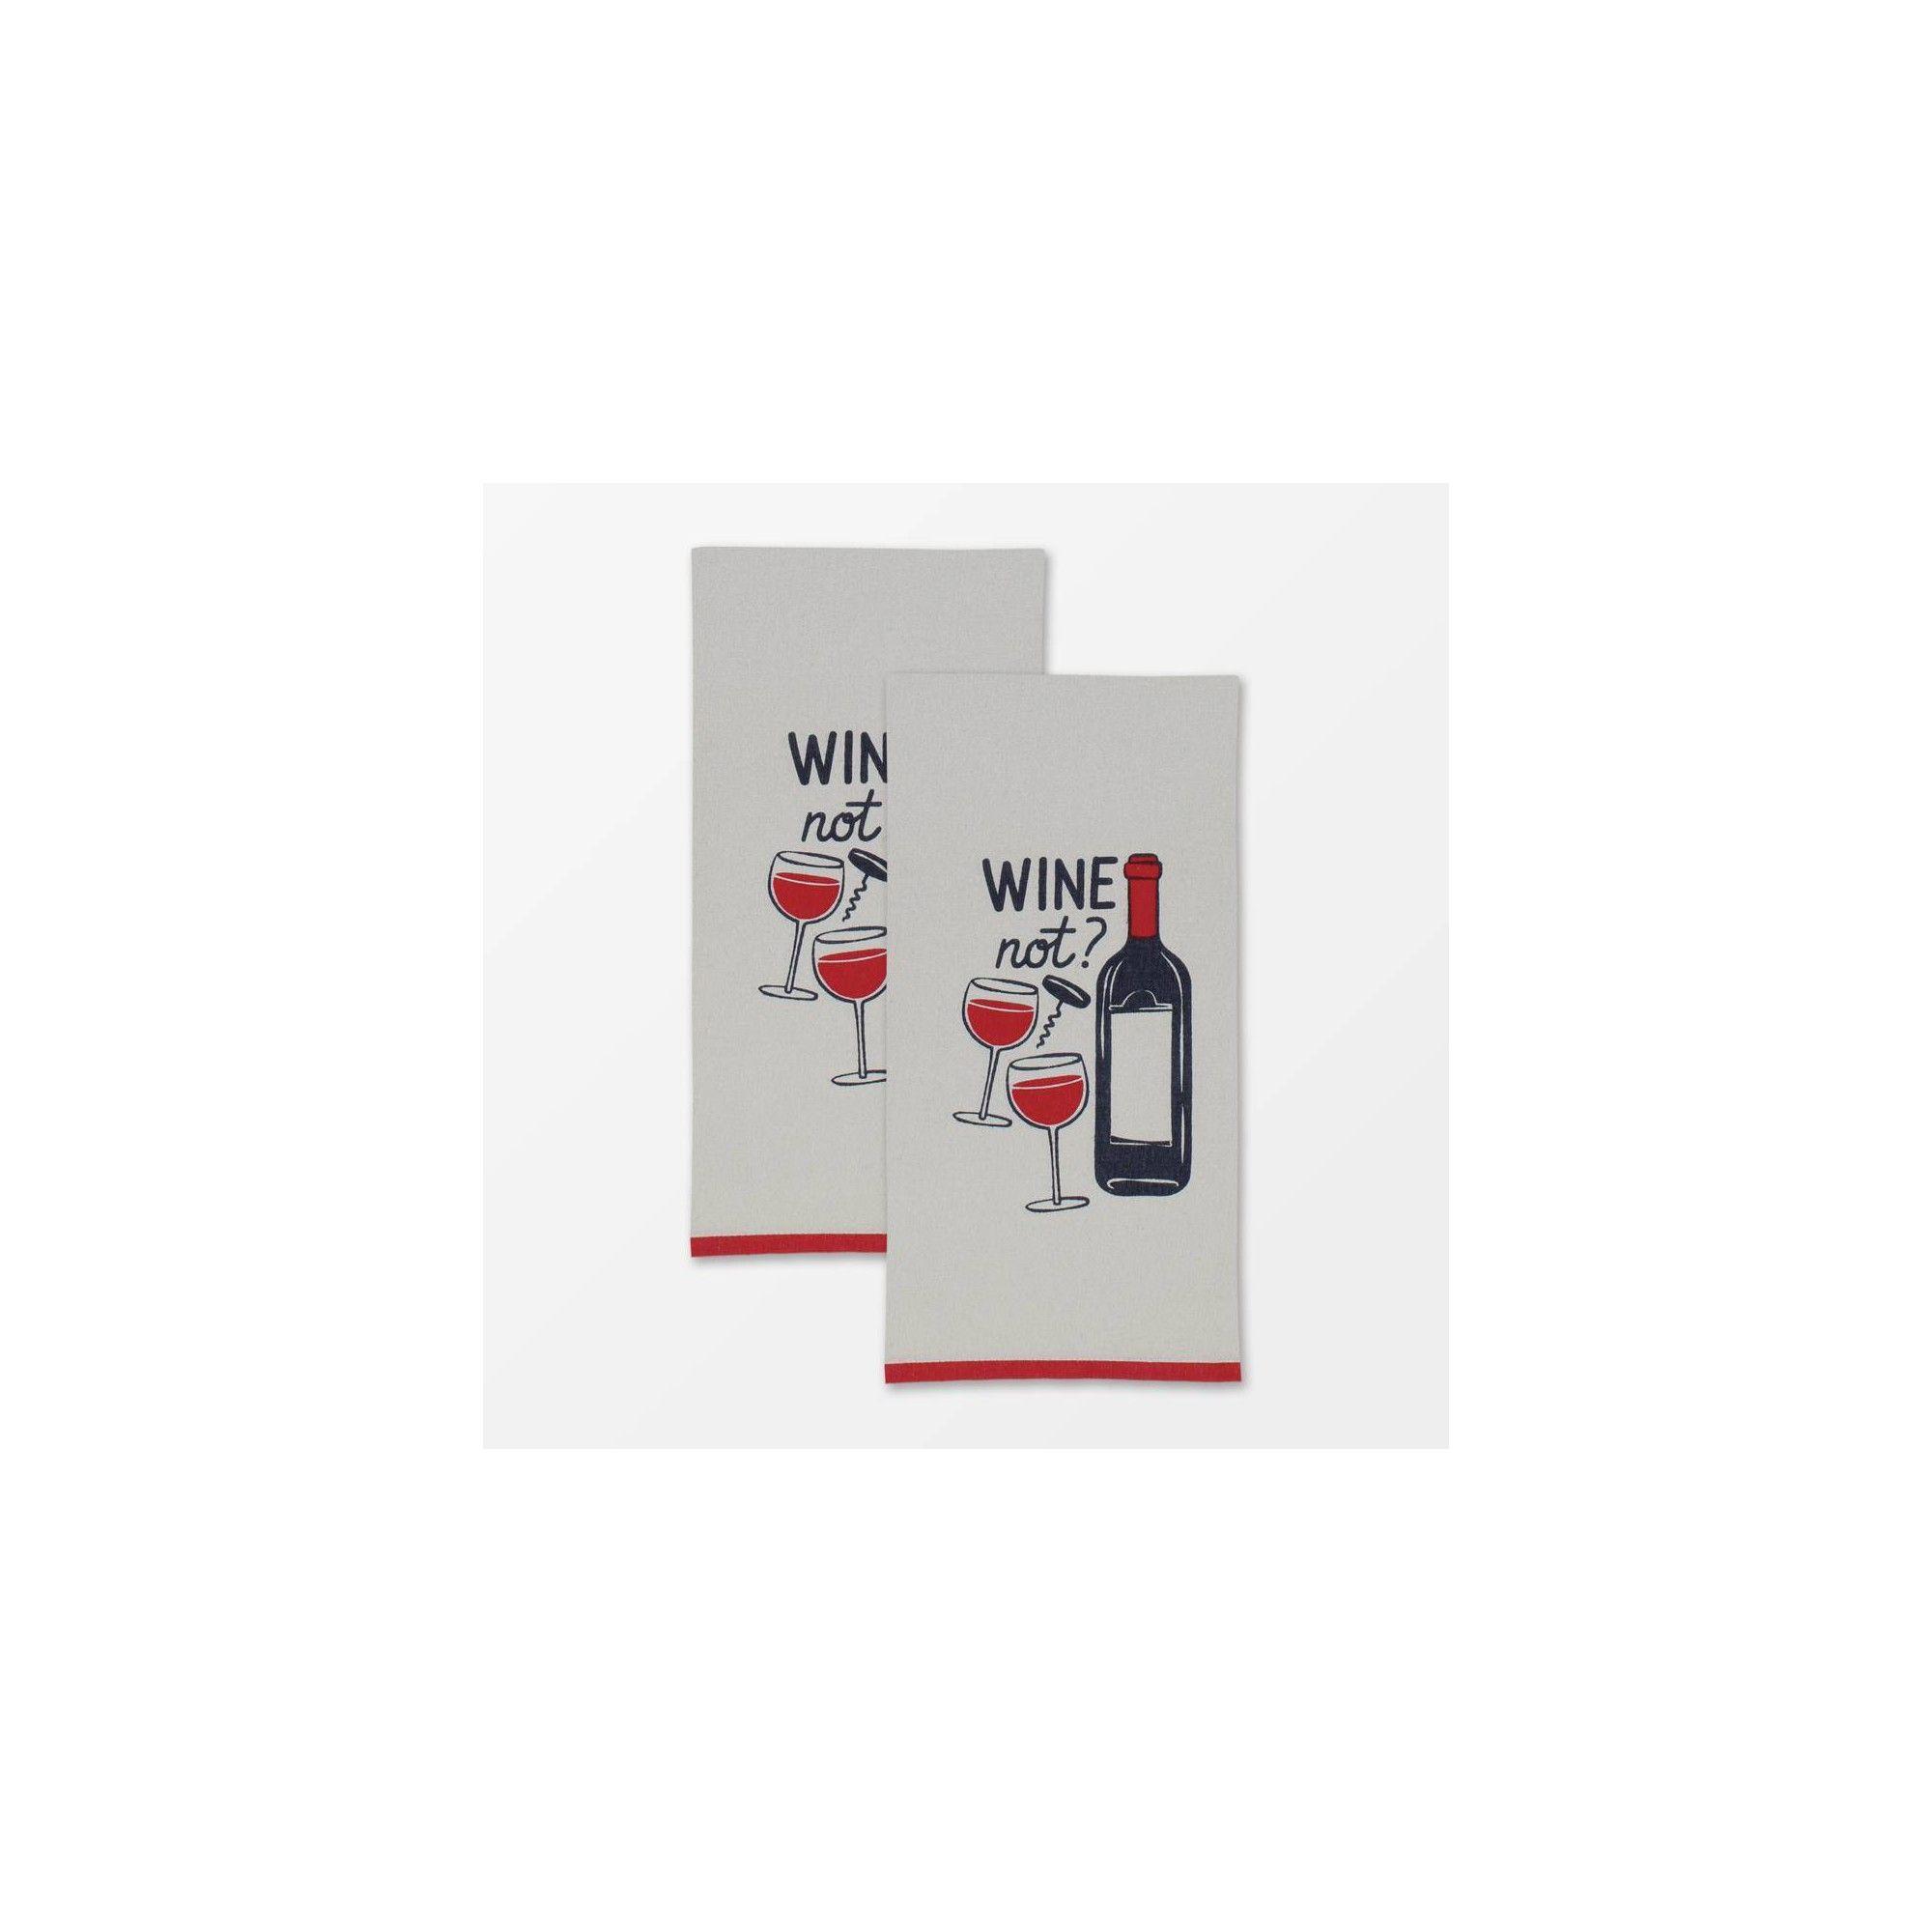 Set of 2 Designer Wine Not Print Towel Gray - MU Kitchen in ...